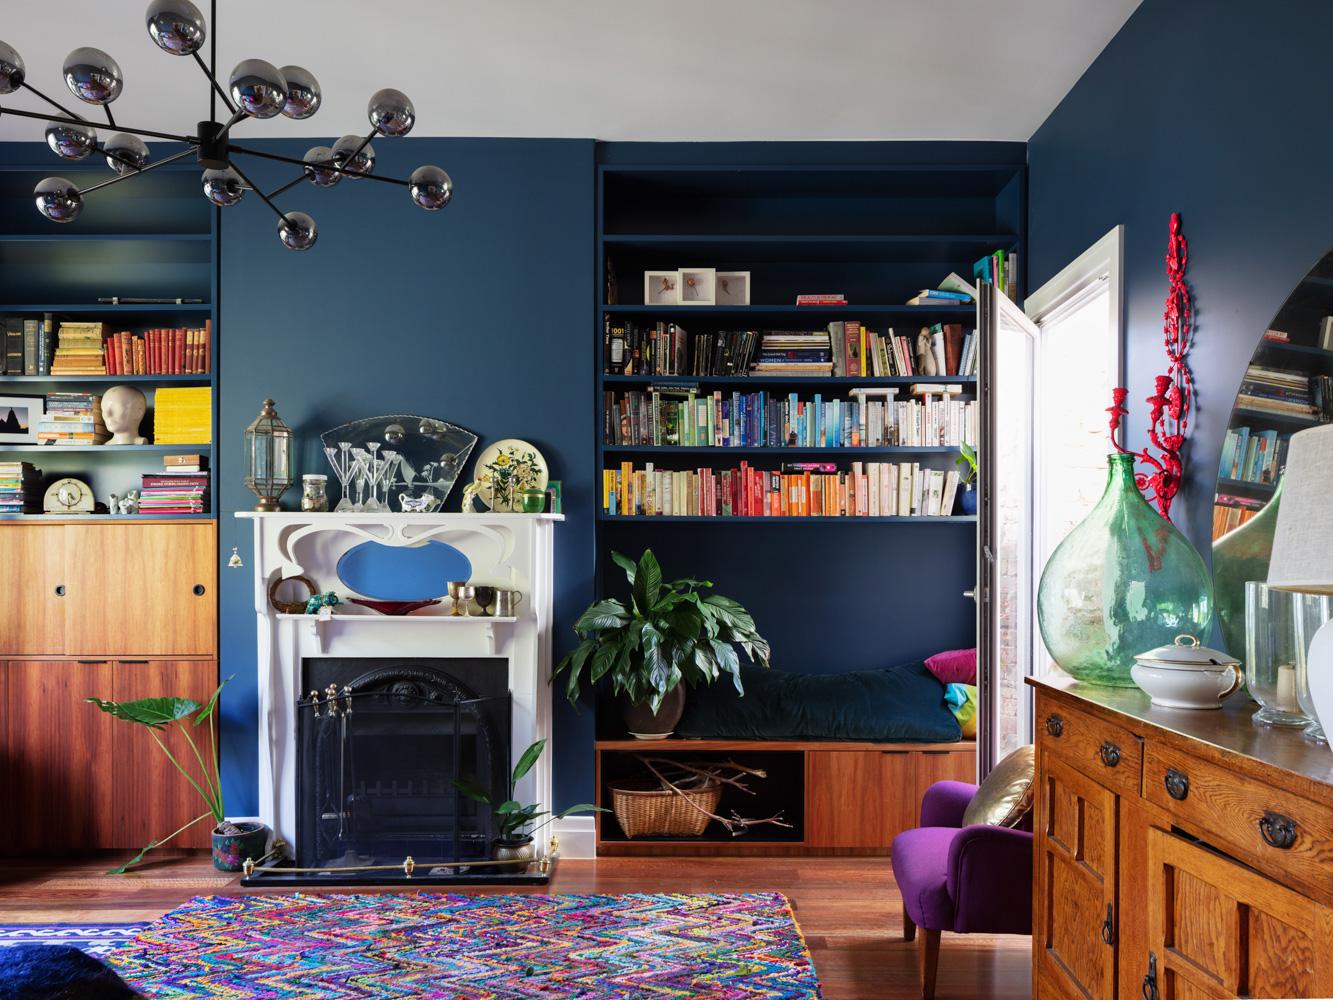 elm-st-house-gardiner-architects-melbourne-architecture-the-design-emotive-13.jpg